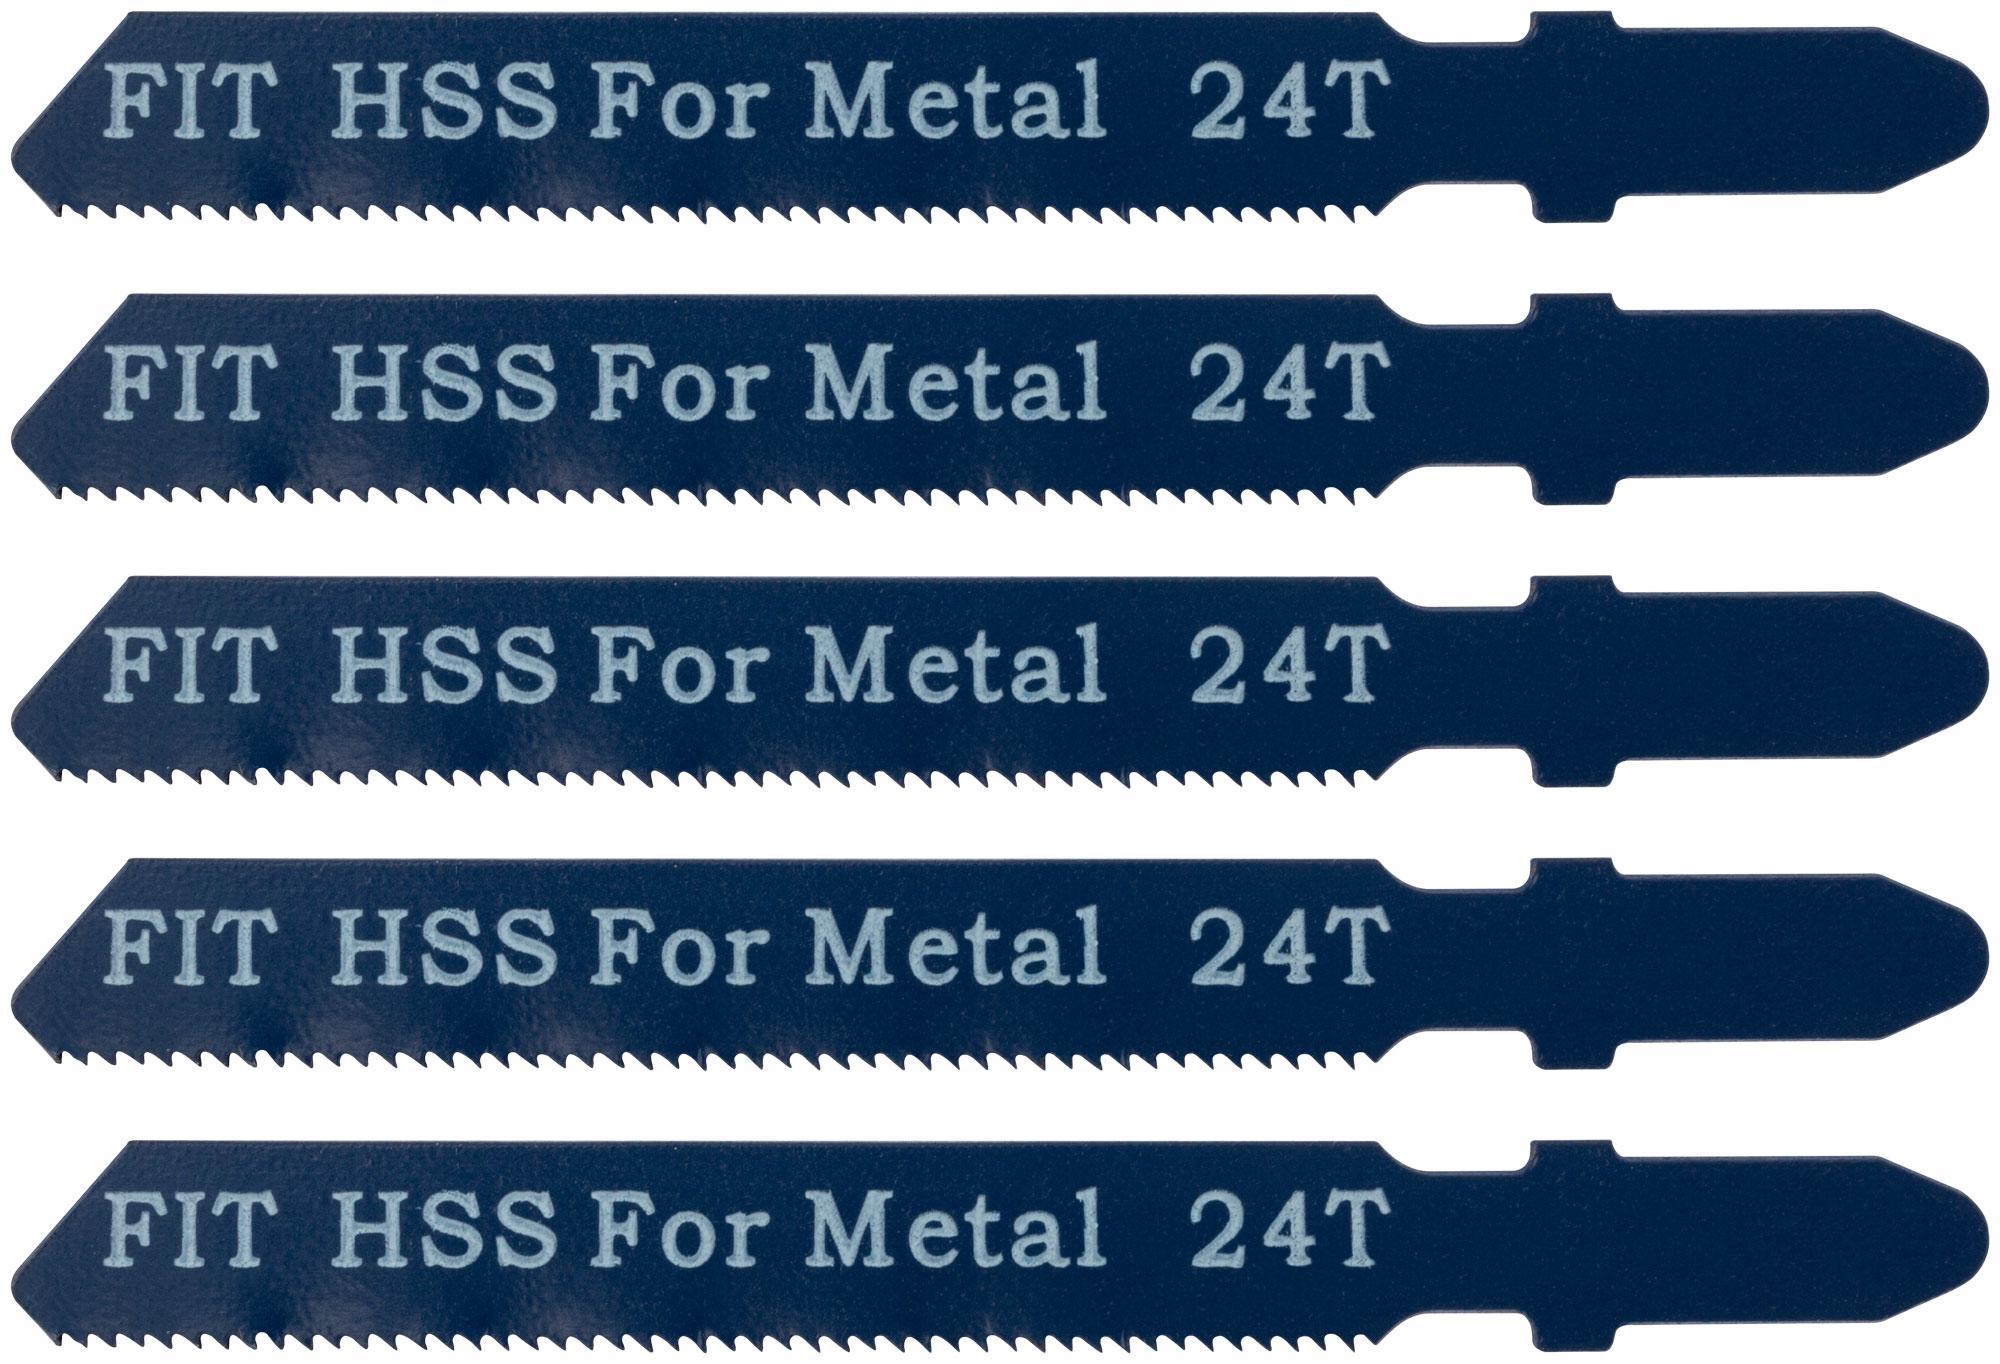 Пилки для лобзика Fit 41124 пилки для лобзика по дереву набор 5 шт стандарт